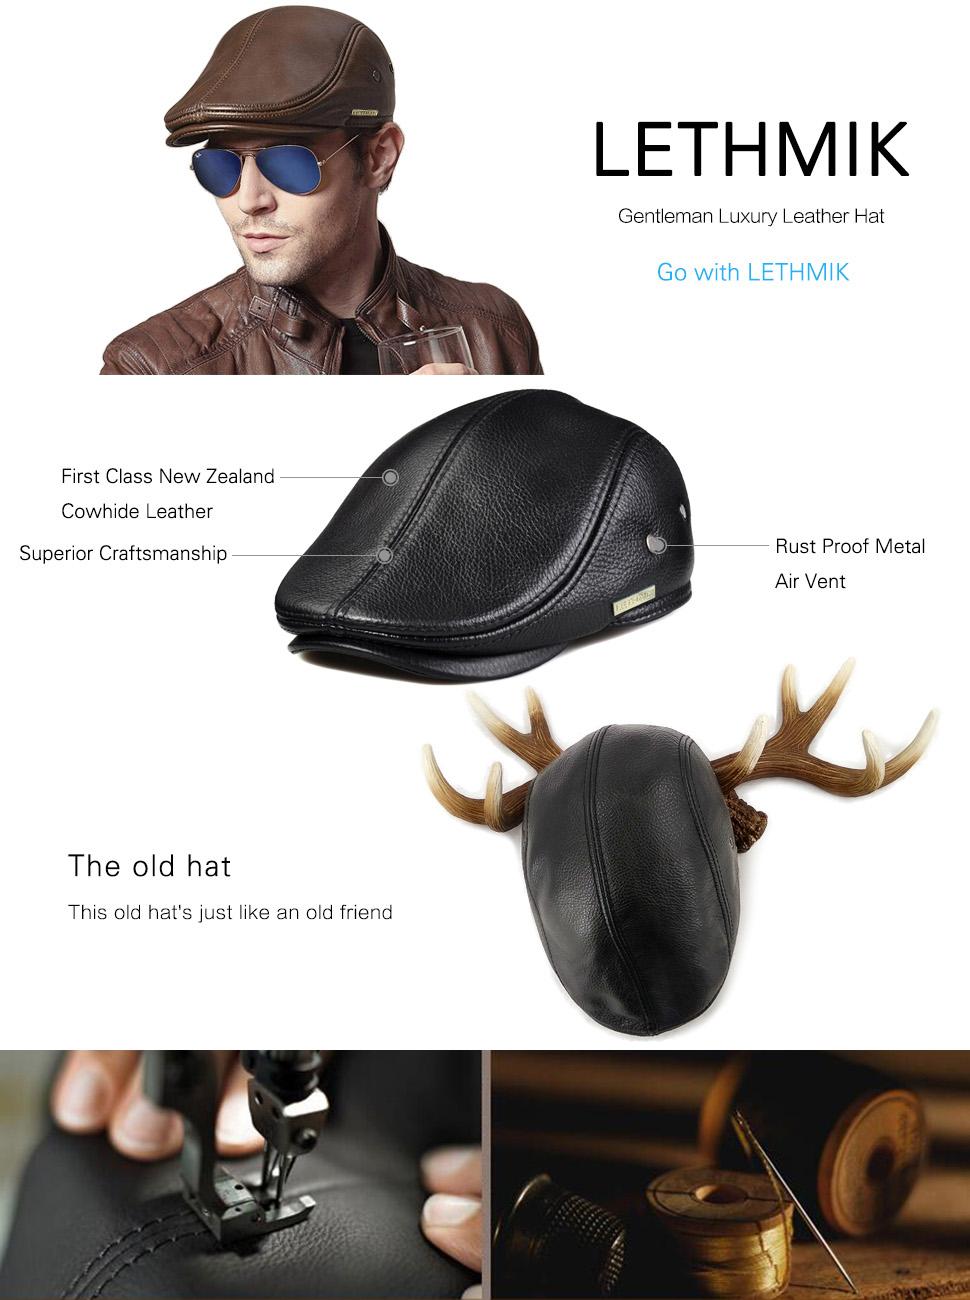 ede9afc1a60 LETHMIK Hats Collection. LETHMIK Flat Cap Cabby Hat Genuine Leather Vintage  Newsboy Cap Ivy Driving Cap